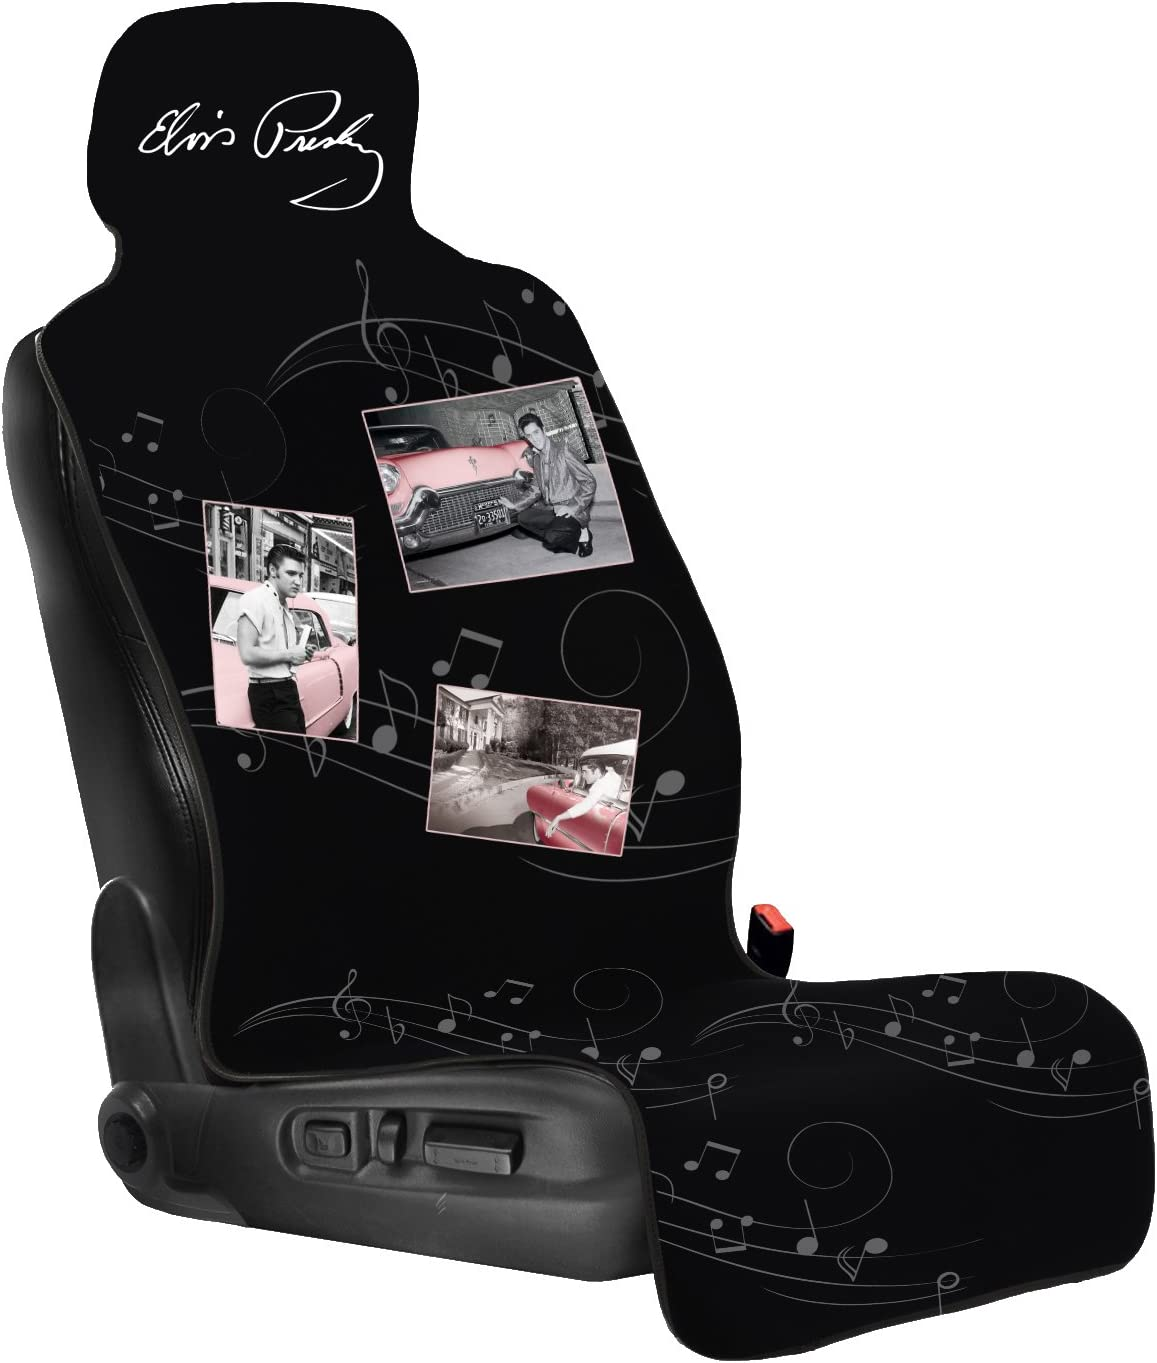 Elvis Presley CarsCover Custom Print Design Car SUV Truck Low Back Seat Covers